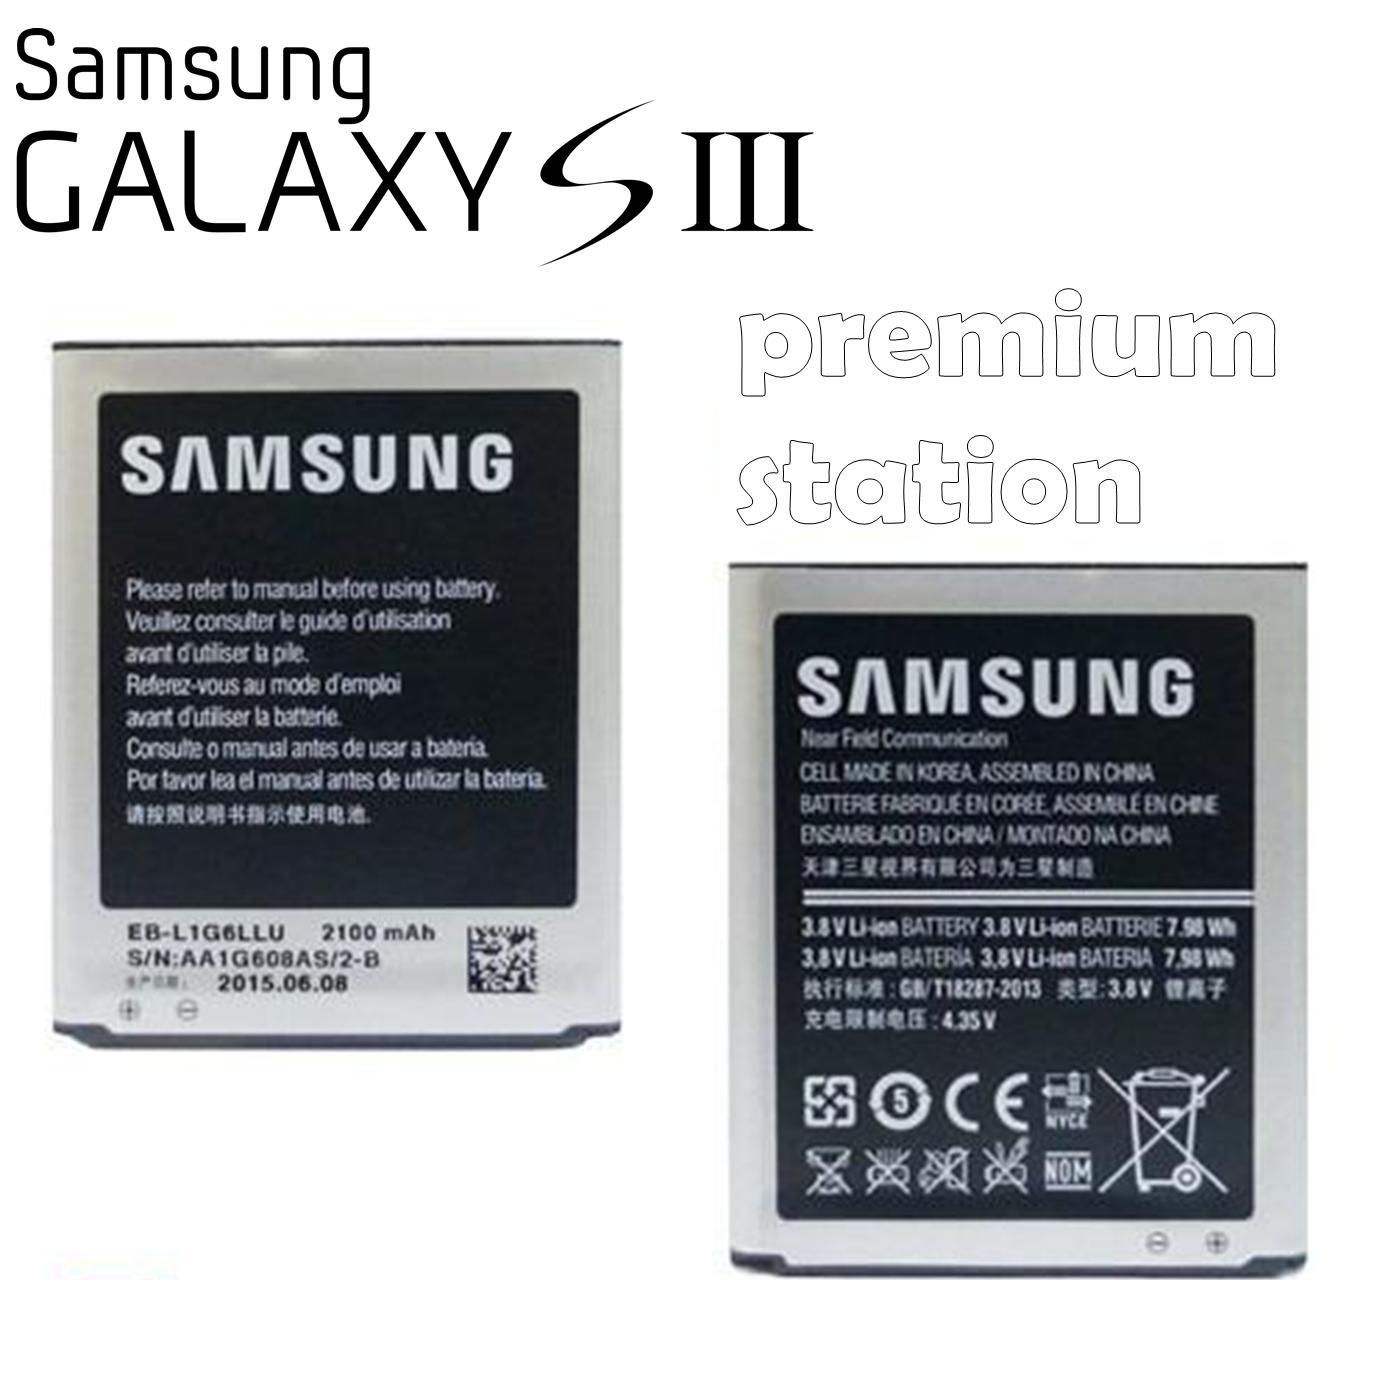 Samsung Premium Galaxy Baterai S3 GT-I9300 EB-L1G6LLU, Kapasitas 2100 mAh